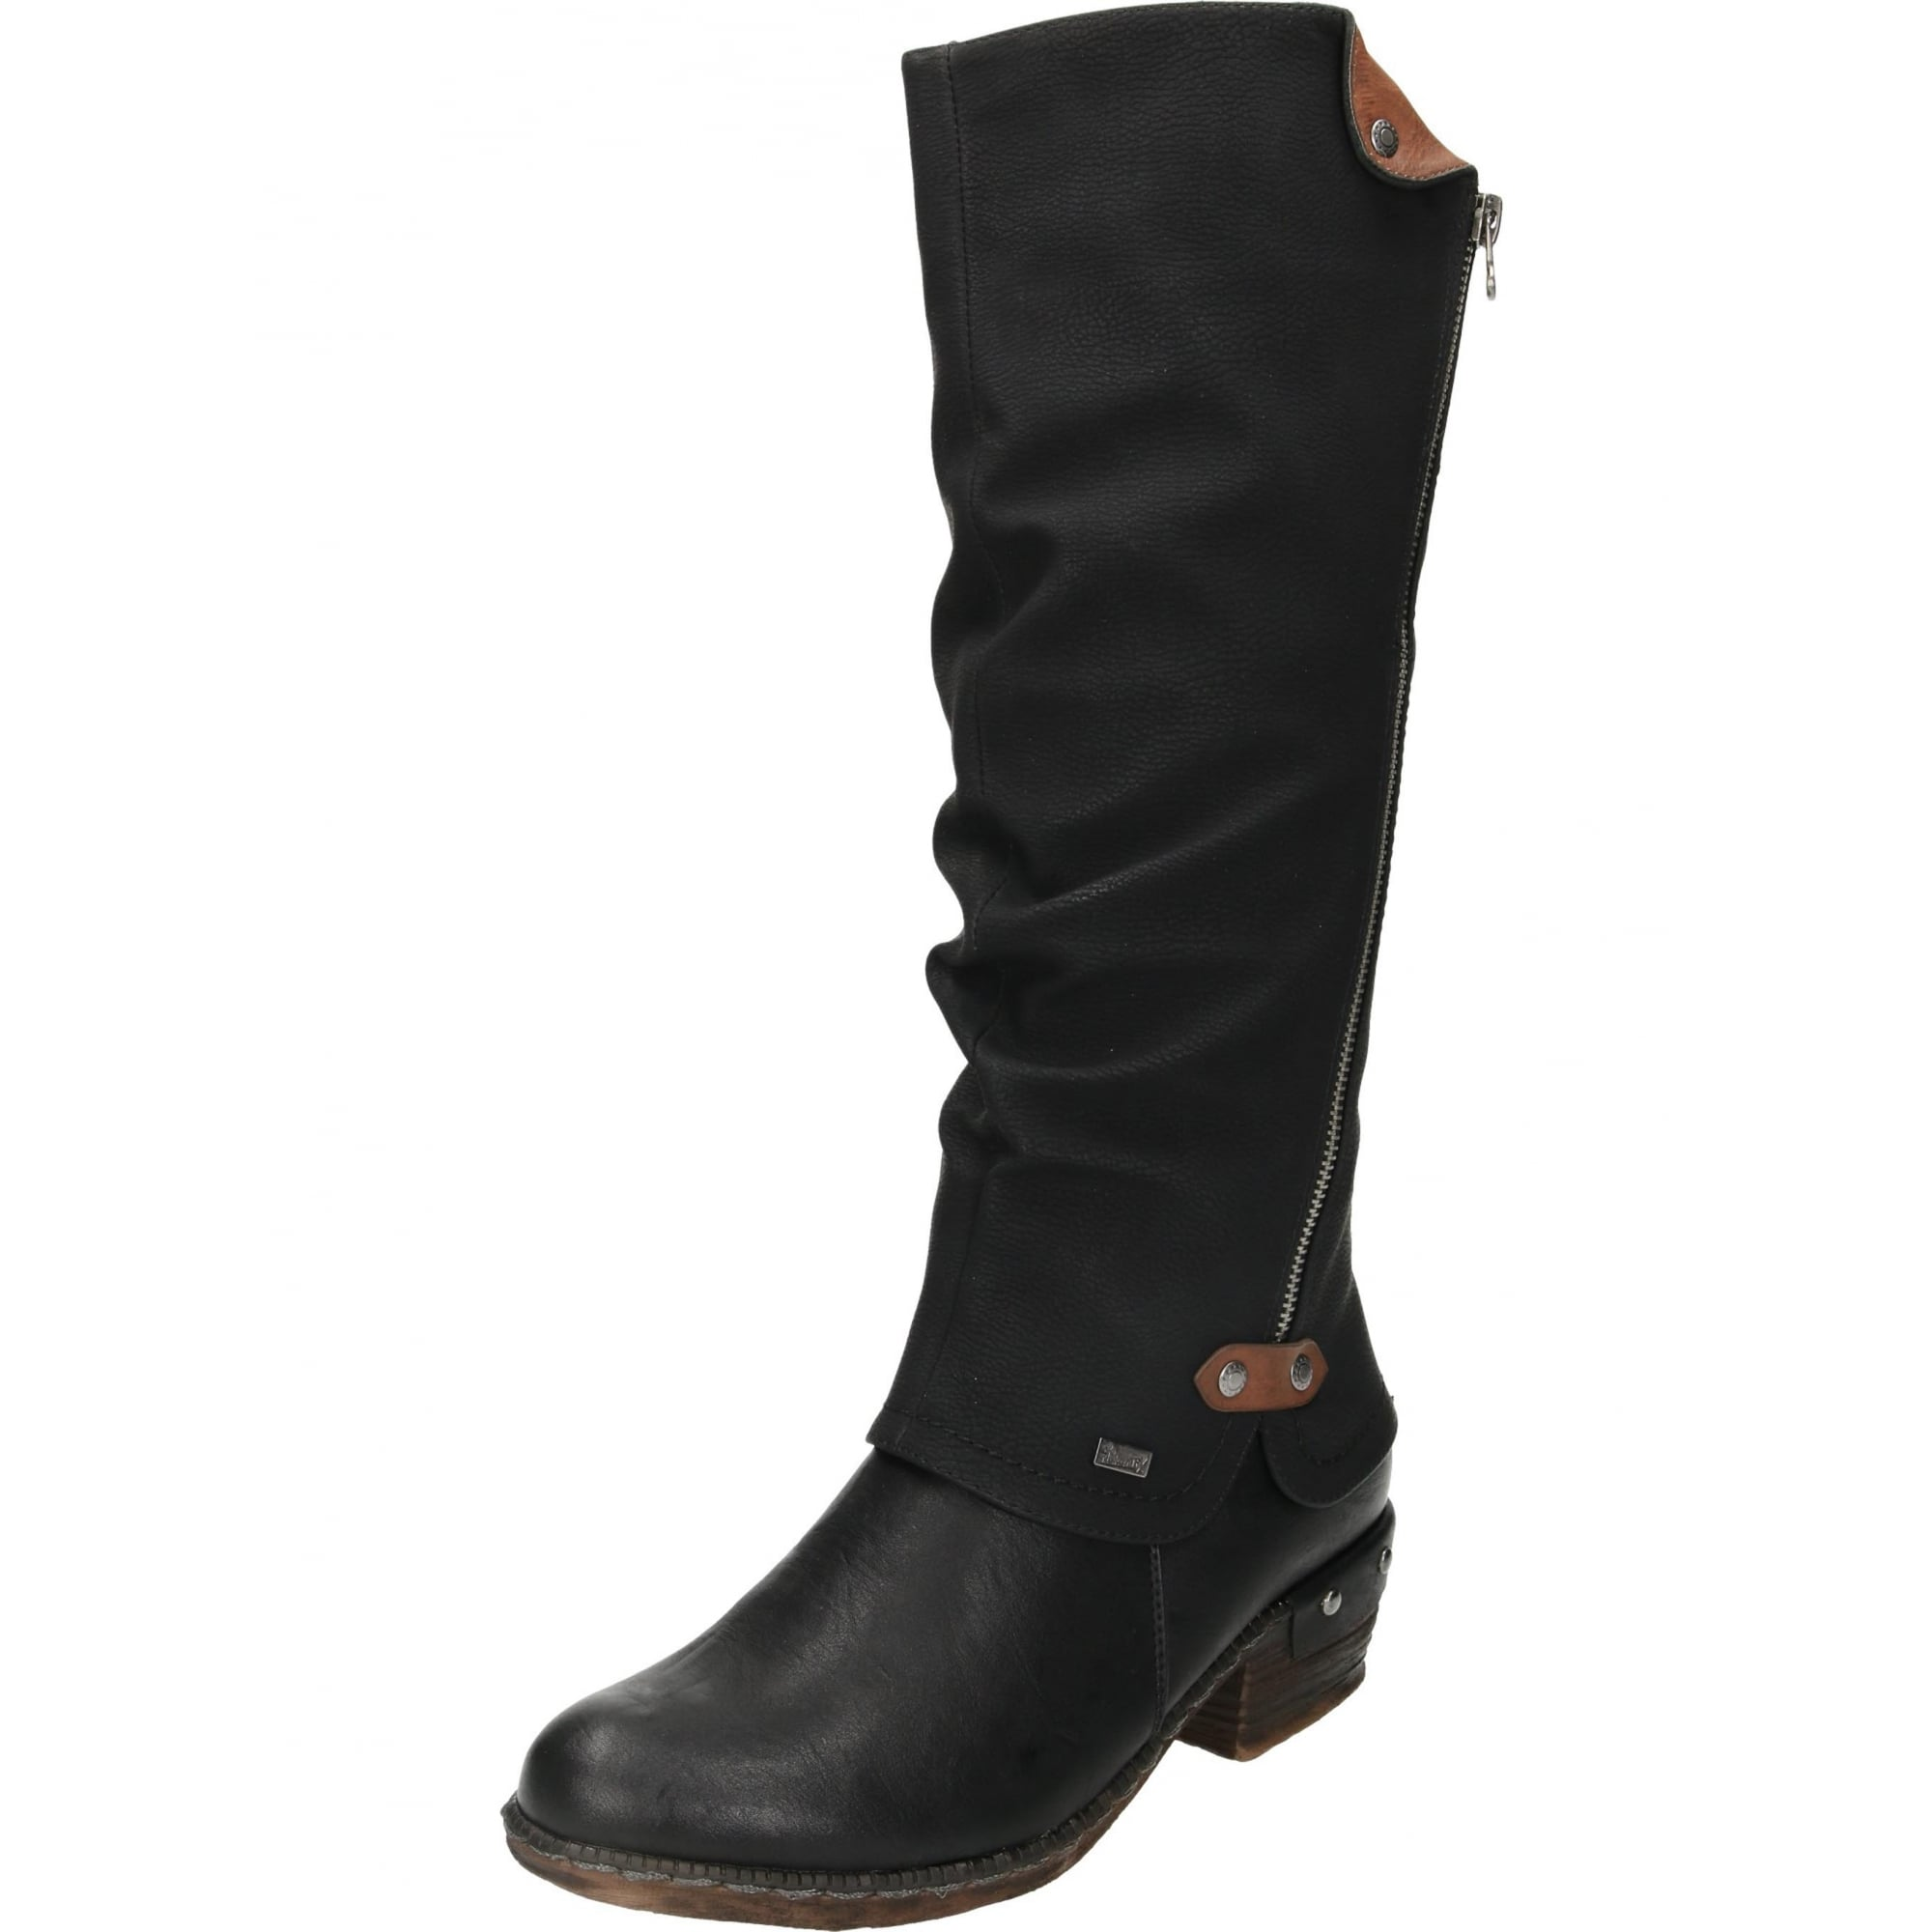 Rieker 93655-00 Tex Black Boots Shower Proof Gator Knee High Heeled Warm Lined